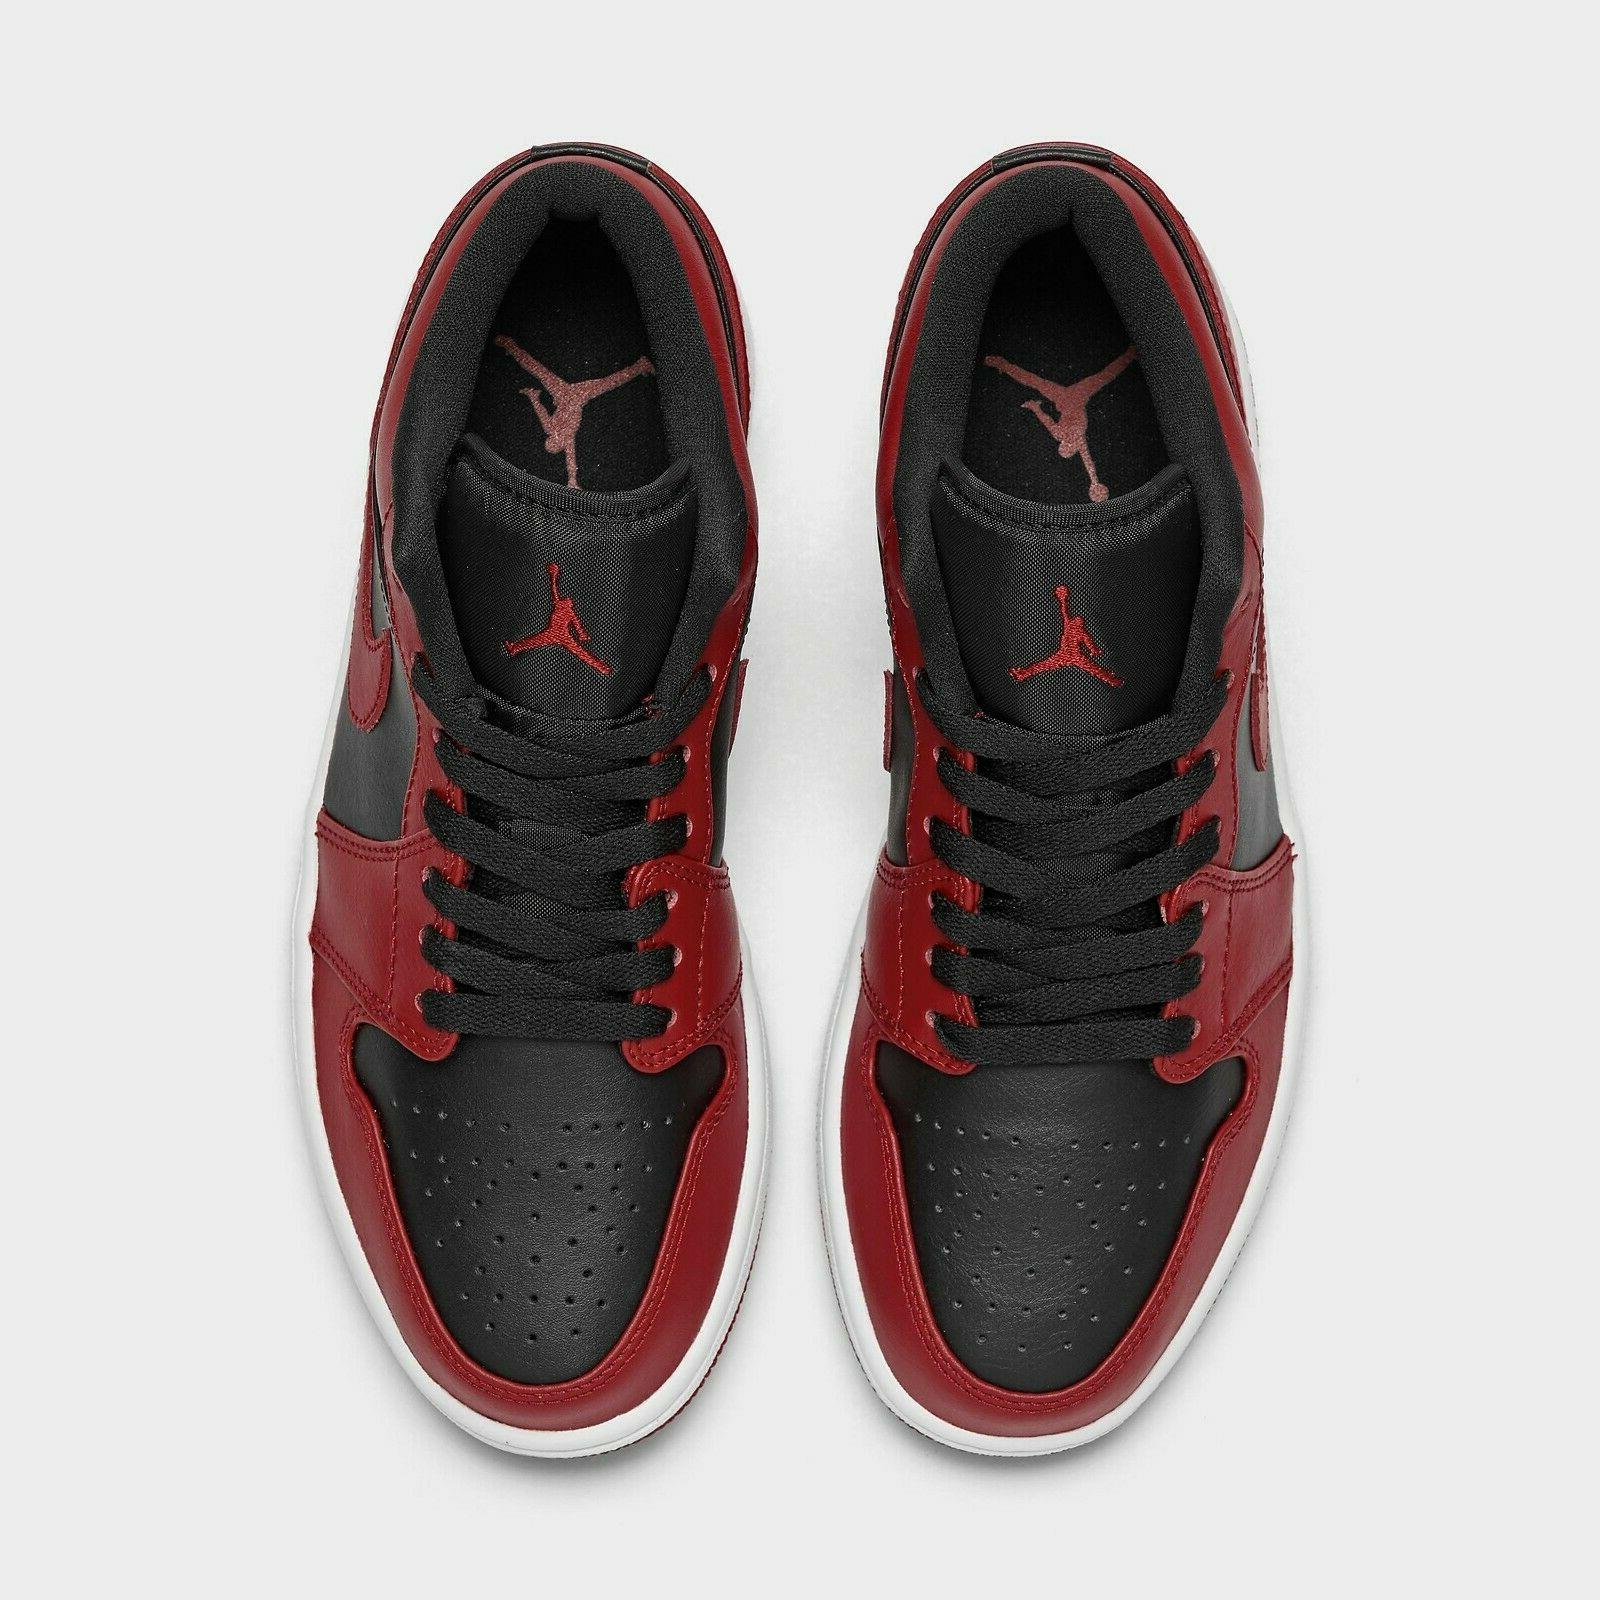 Air Jordan Bred Varsity Red Black 553558-606